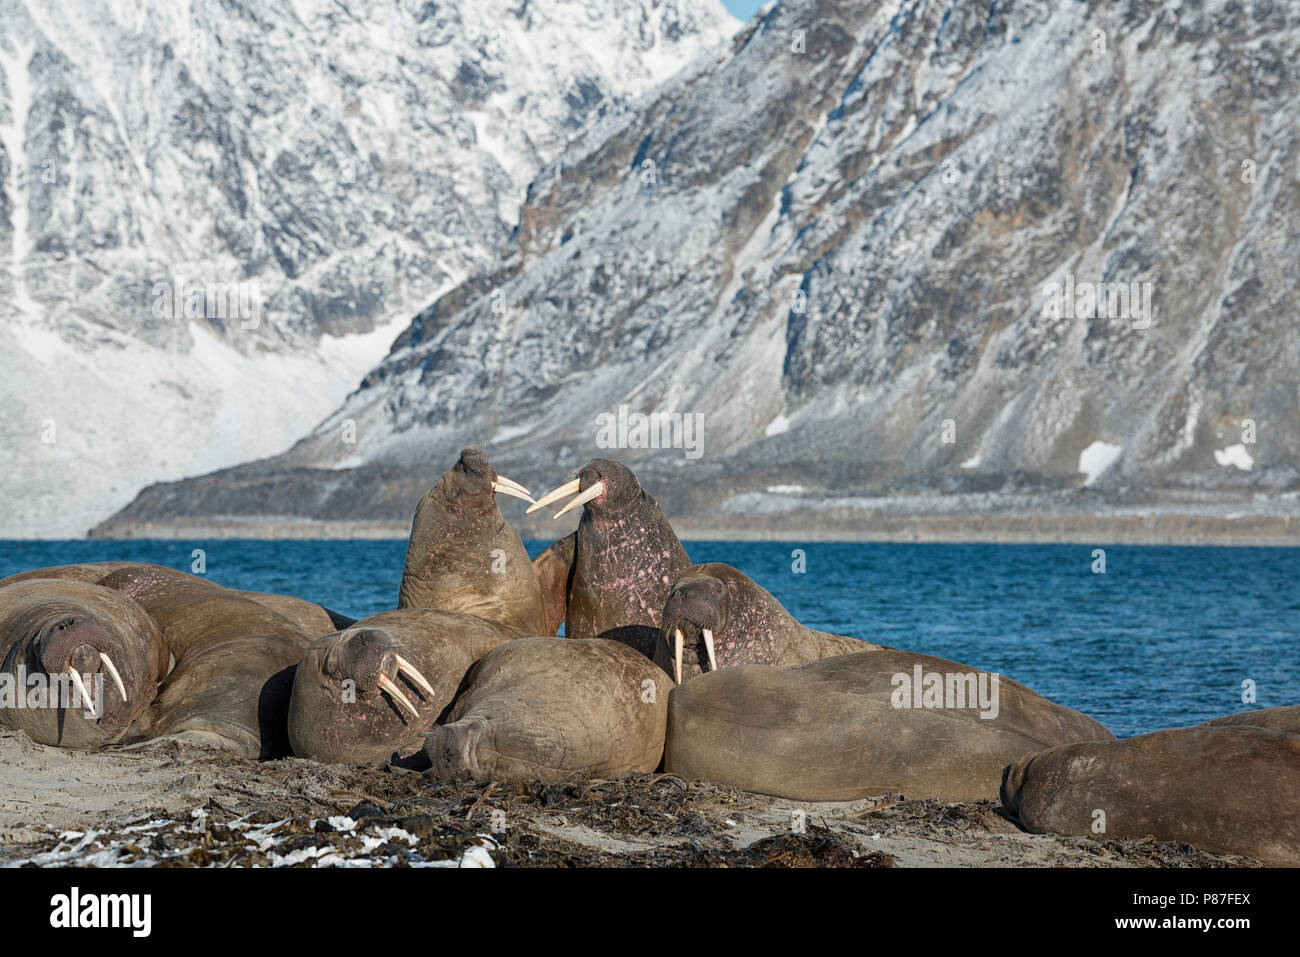 Gruppe der Walrosse in Nordvest-Spitsbergen Smeerenburgfjord, Nationalpark, 2017 Stockbild